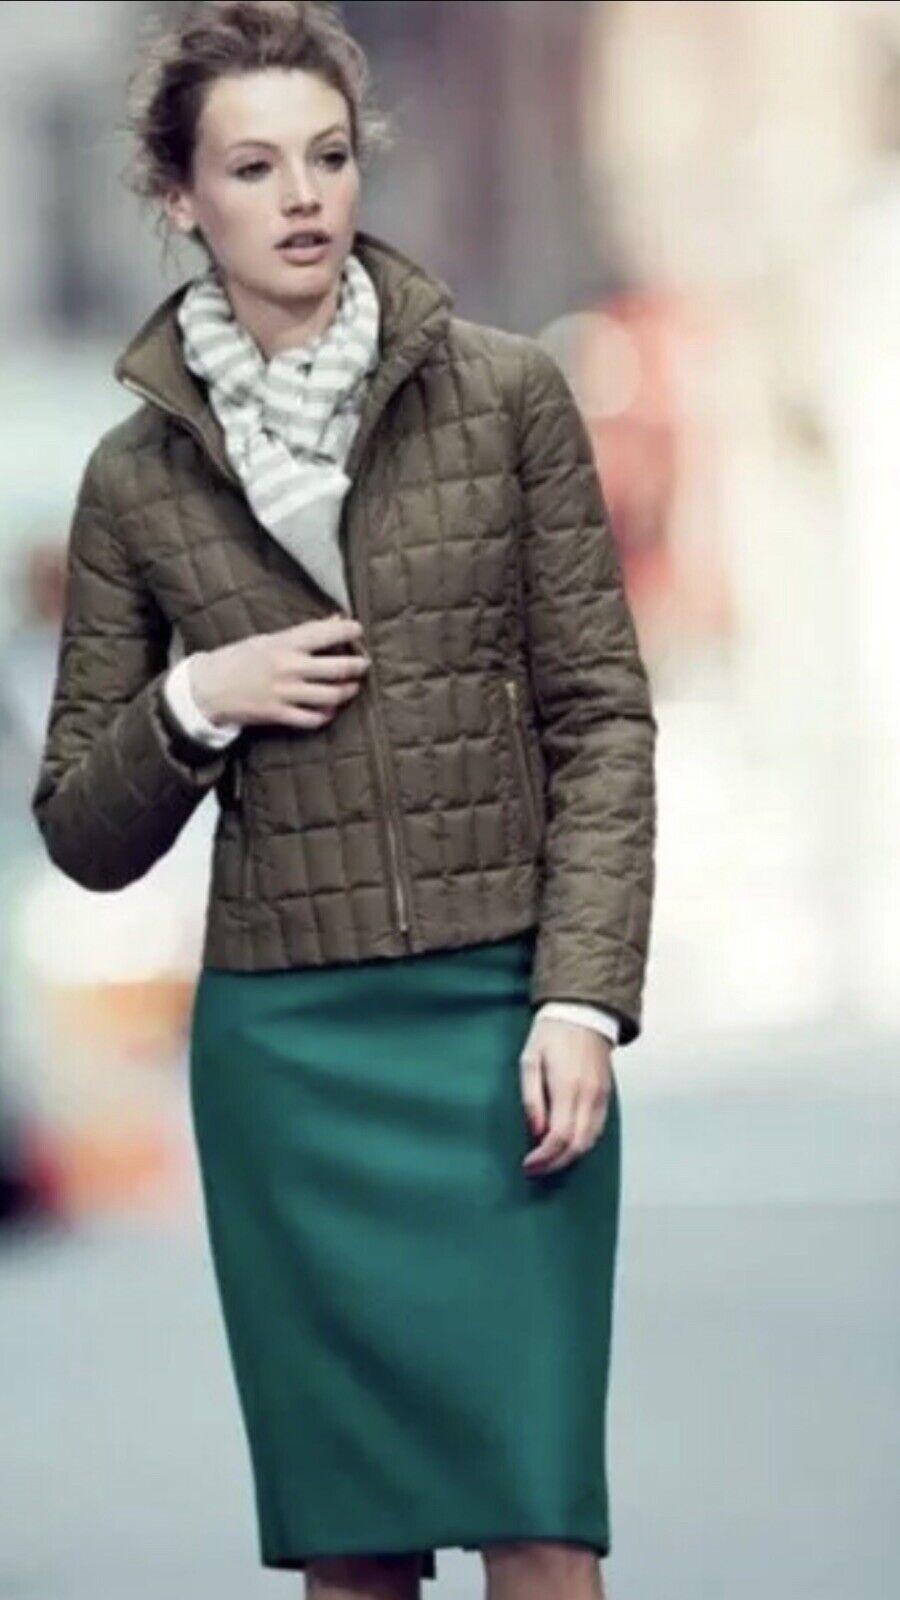 J.CREW STYLISH Green Petite No.2 Pencil Skirt In Bi-Stretch Cotton Size 6 Petite